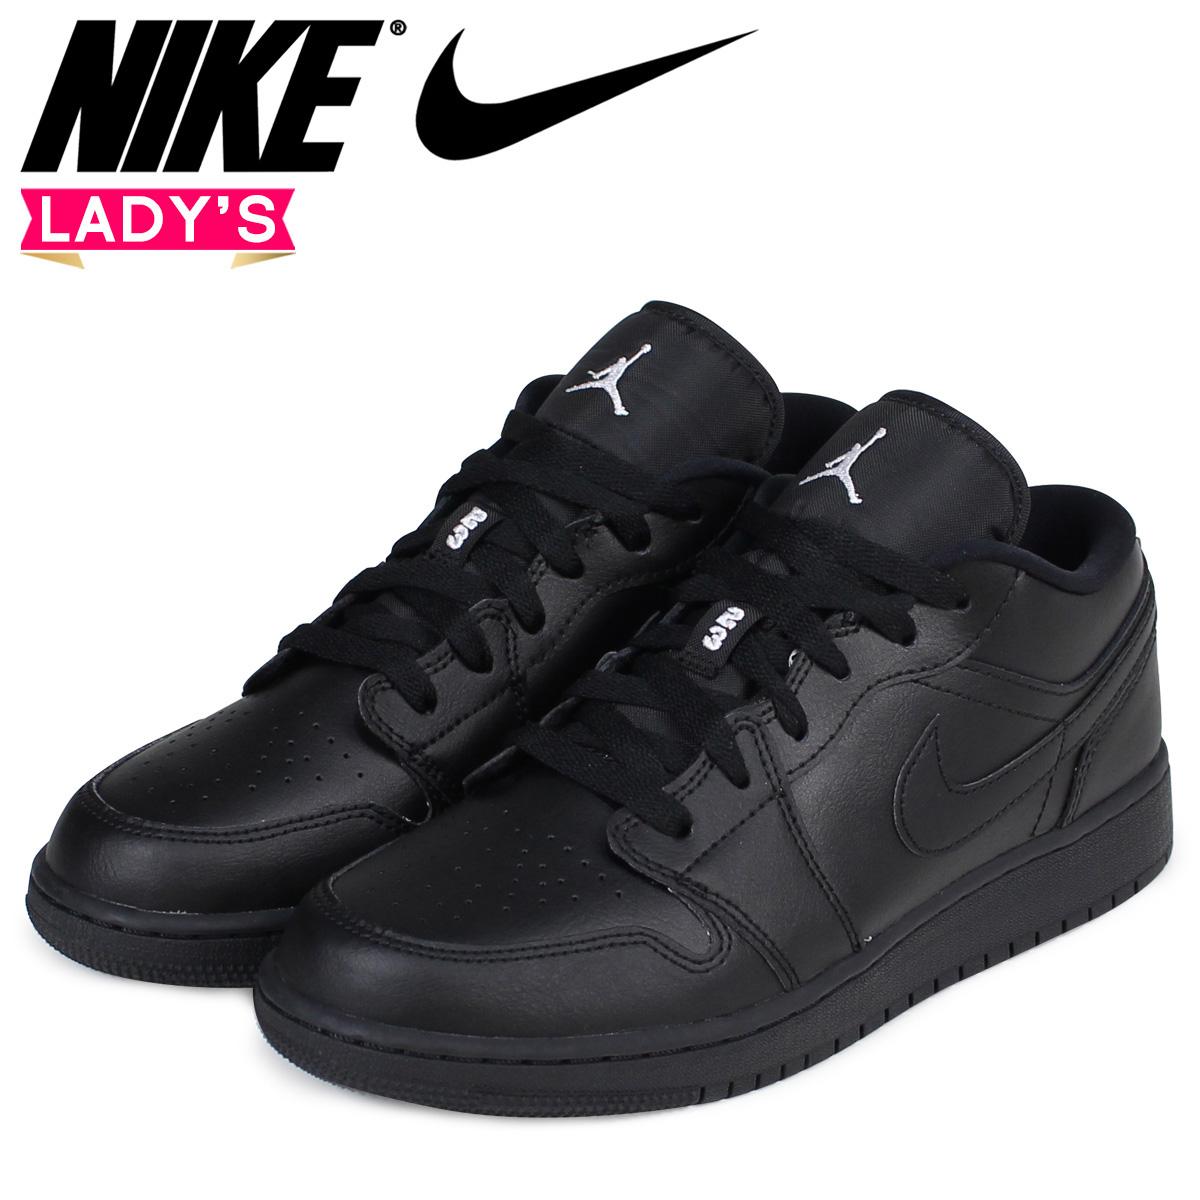 592e97de7d9a Sugar Online Shop  NIKE Nike Air Jordan 1 LOW Lady s sneakers AIR ...